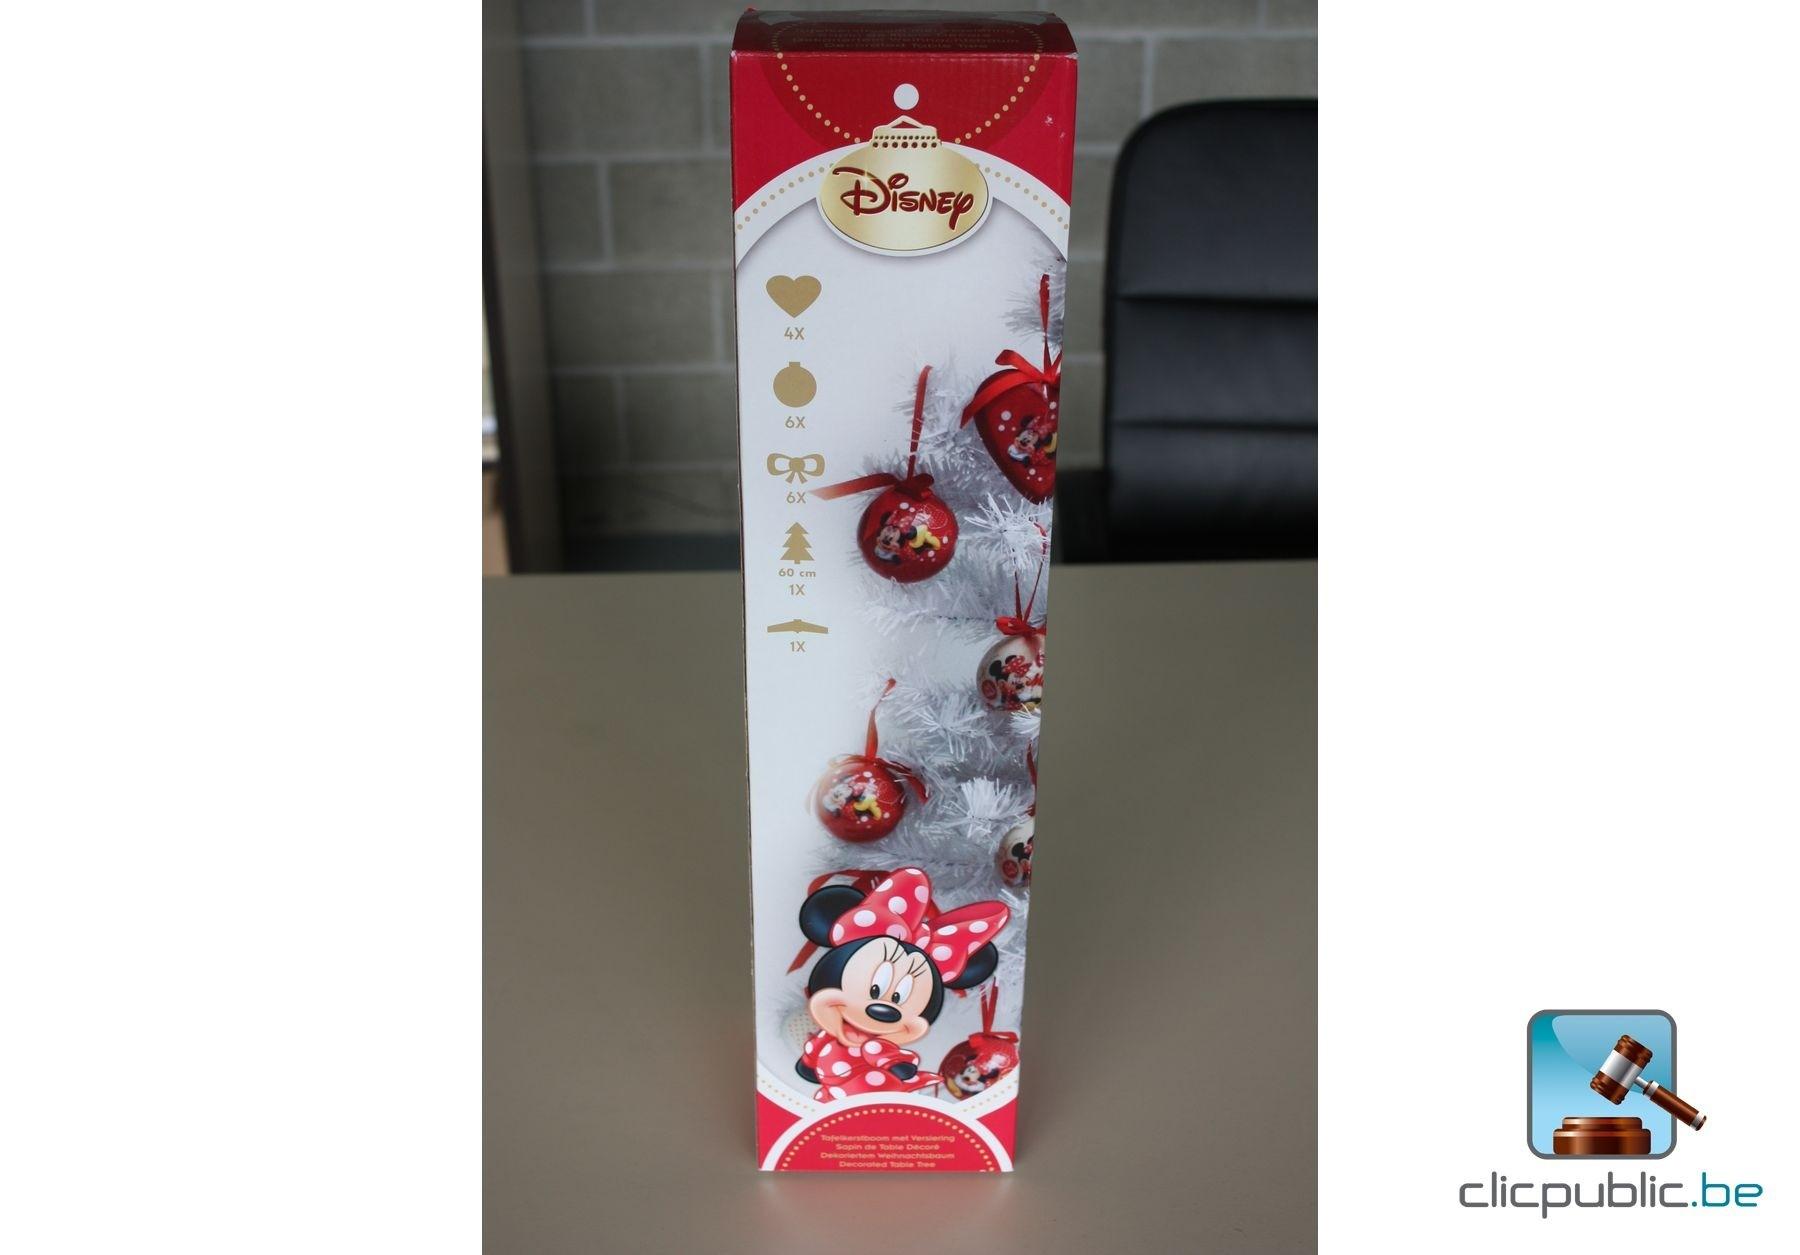 #A92232 Décorations De Noël Sapin à Vendre Sur Clicpublic.be 5319 decorations de noel a vendre 1800x1255 px @ aertt.com